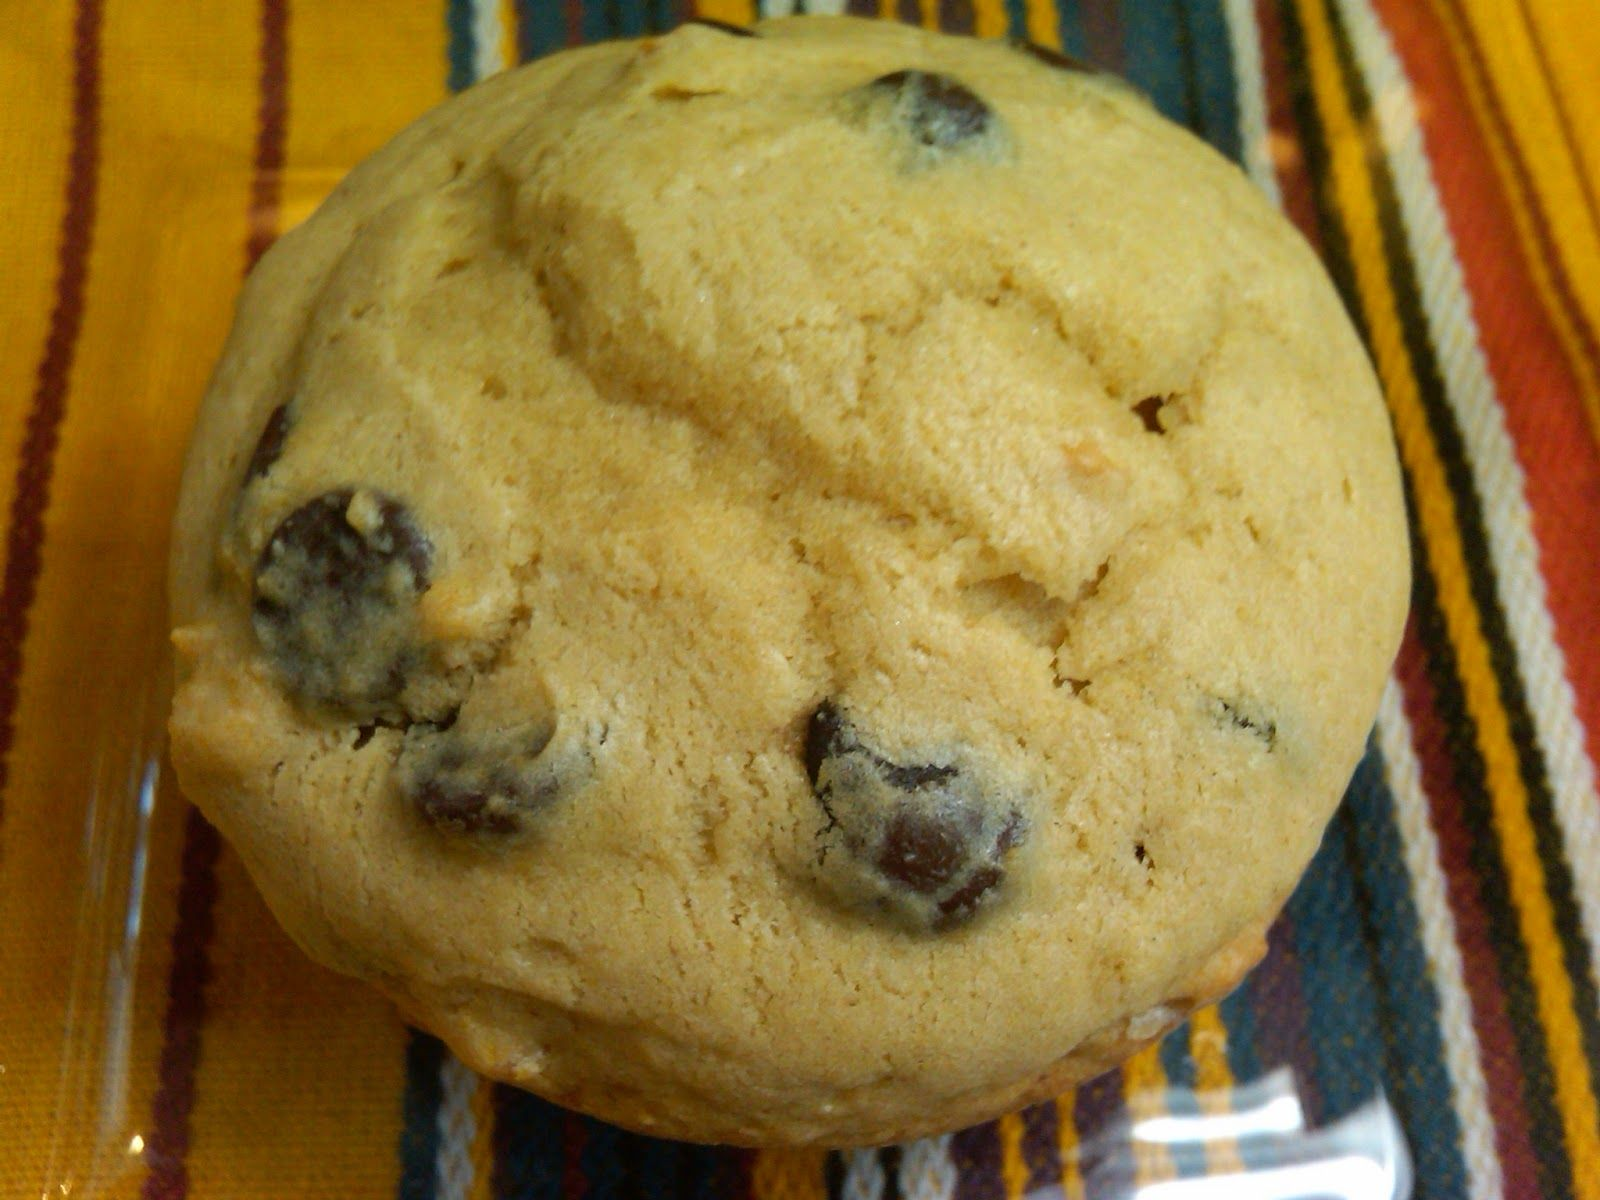 Chunky Peanut Butter & Dark Chocolate Muffins...